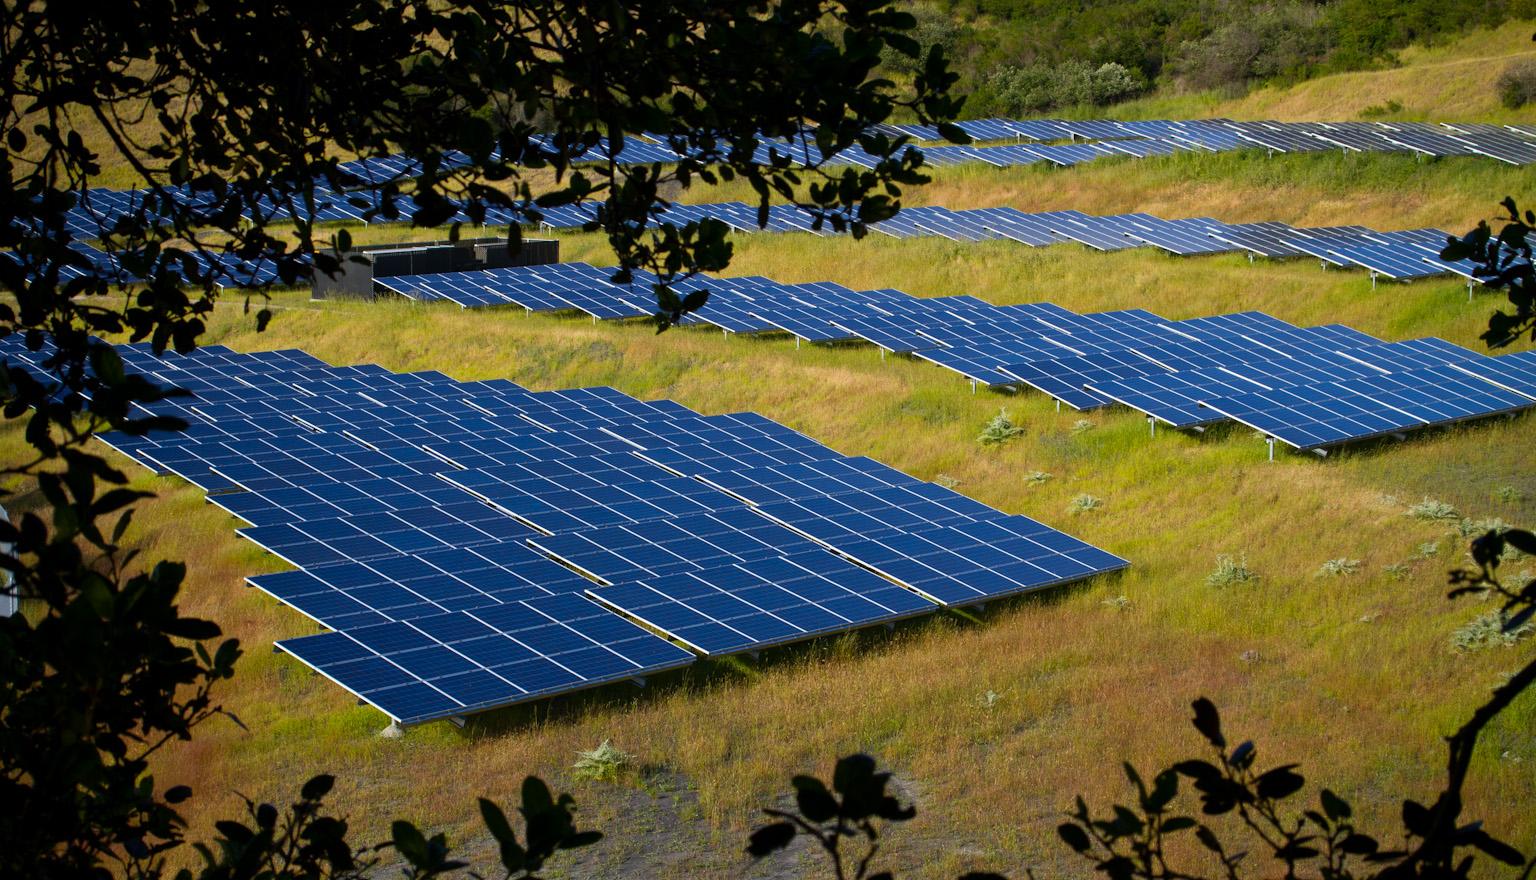 Solar Farm by Michael Mees via a CC BY 2.0